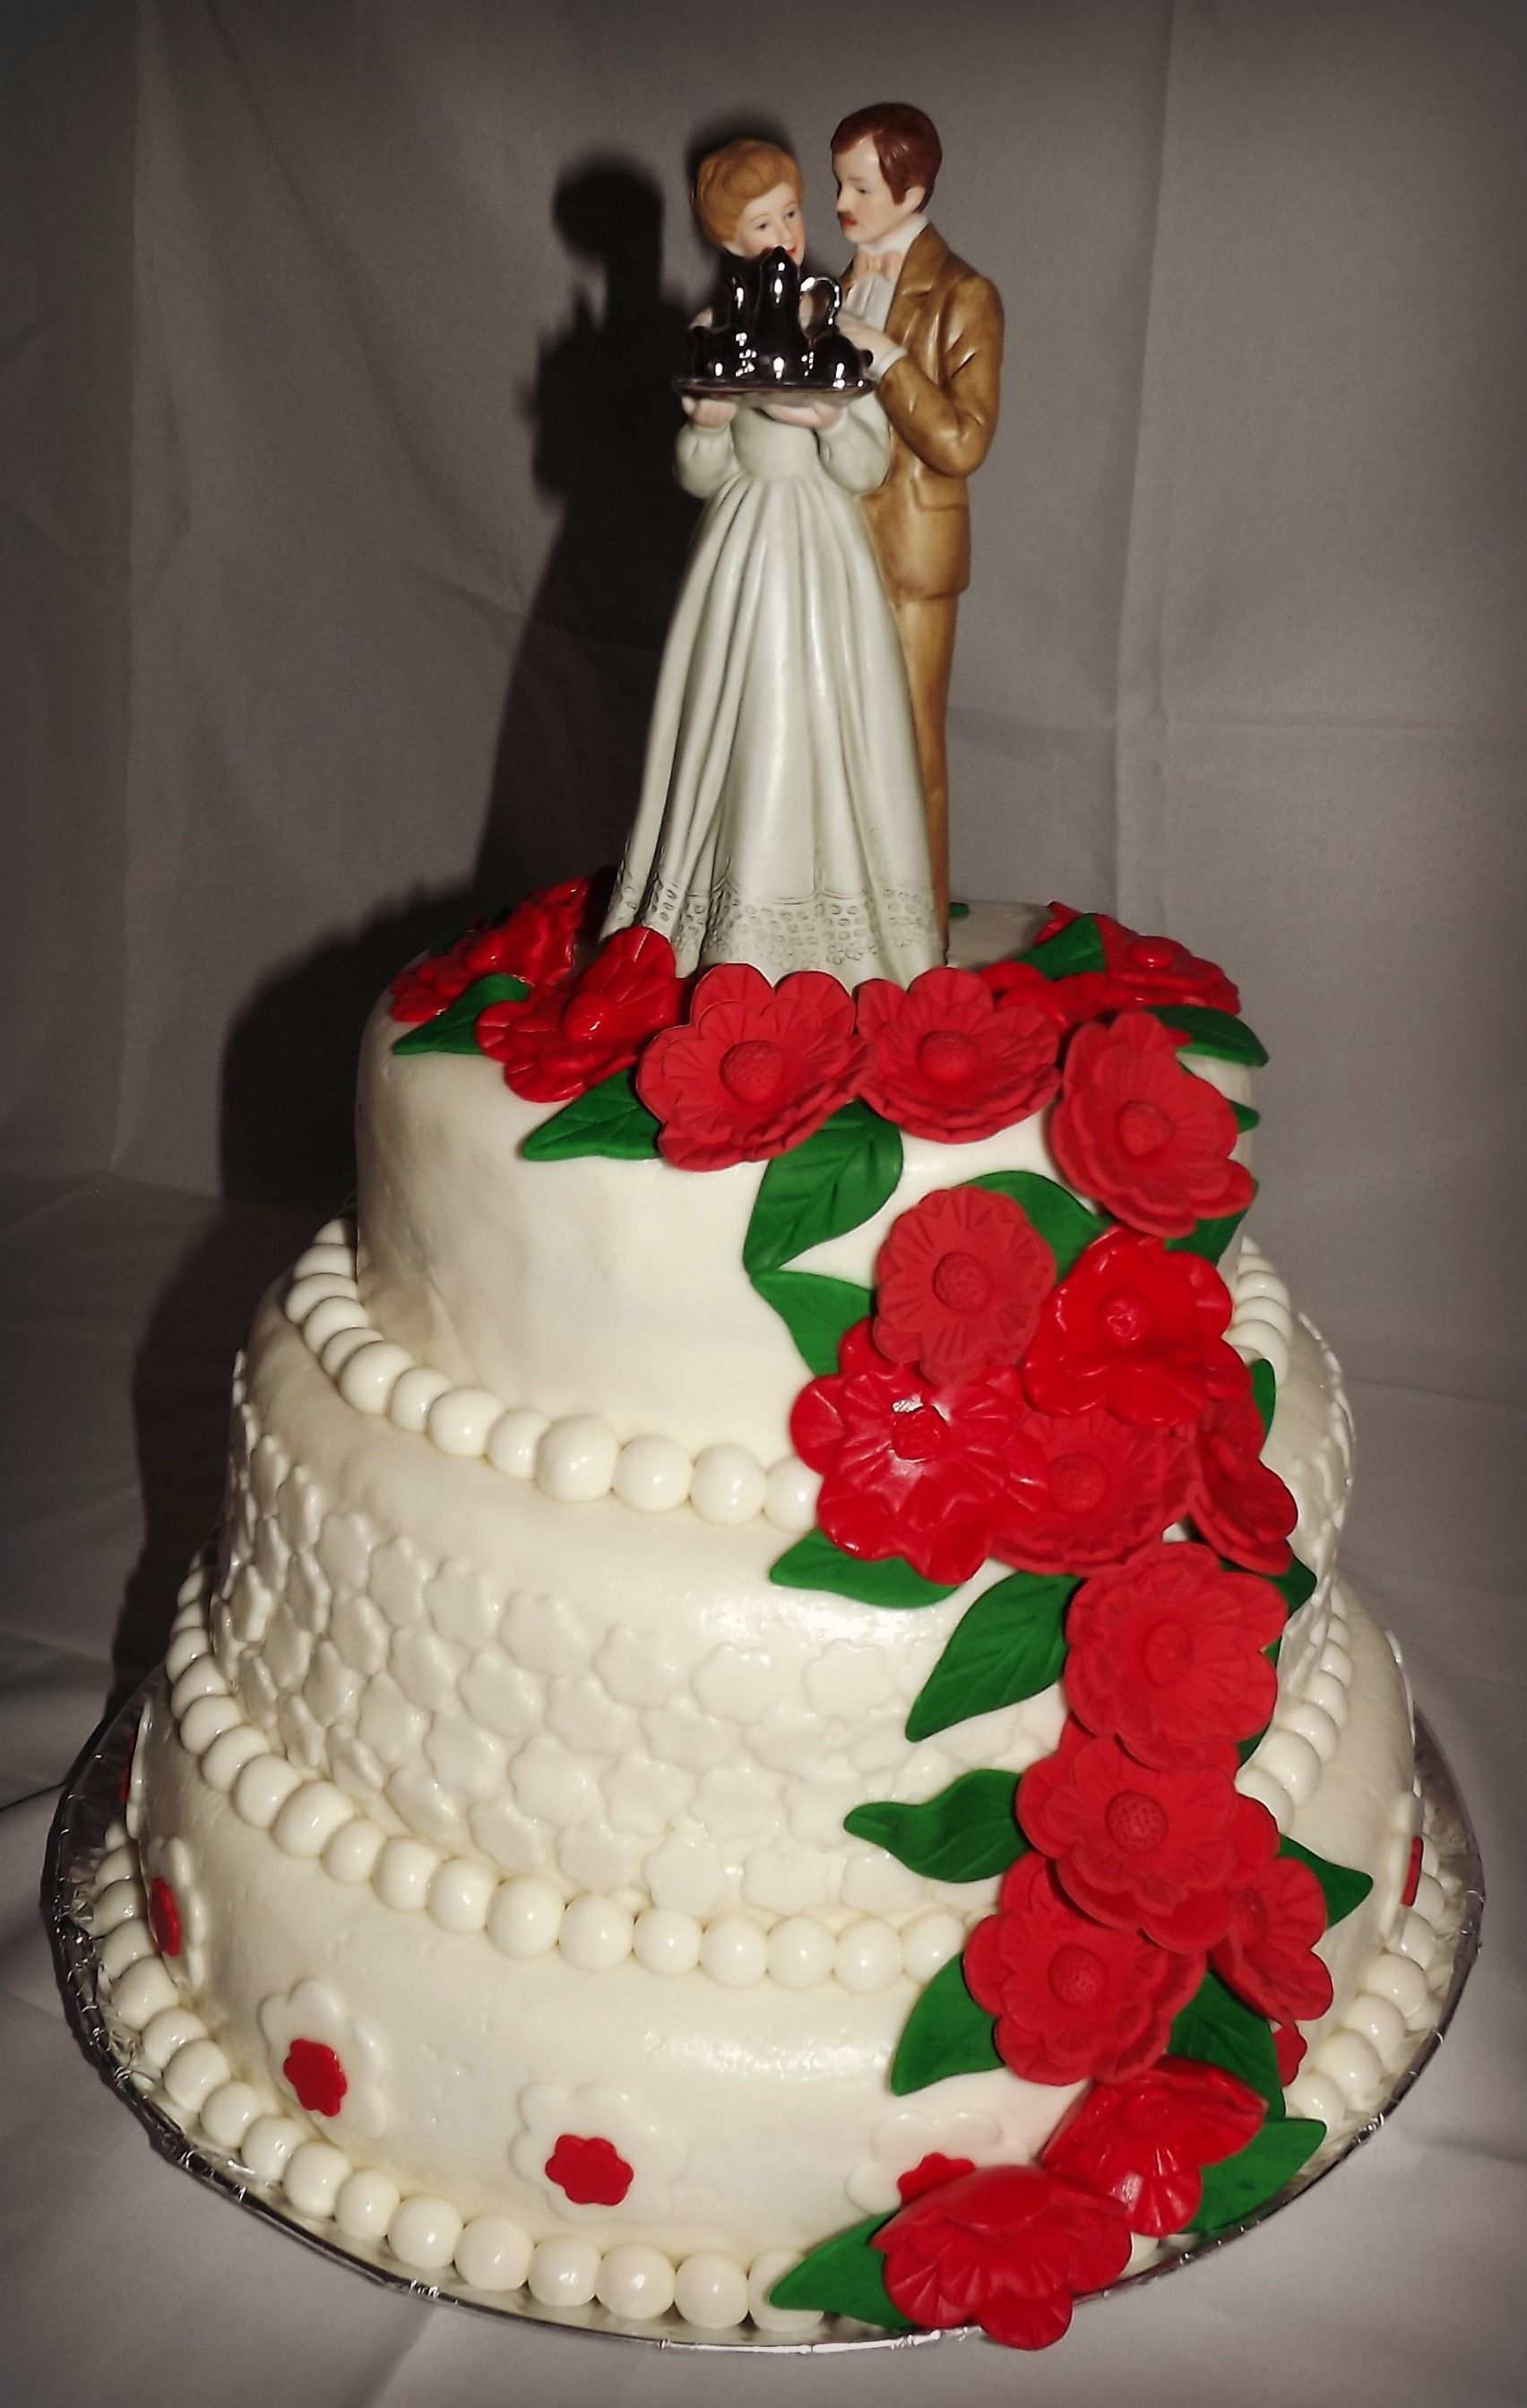 40th wedding anniversary cake- 3 tier vanilla with custard filling, butter cream icing, marshmallow fondant